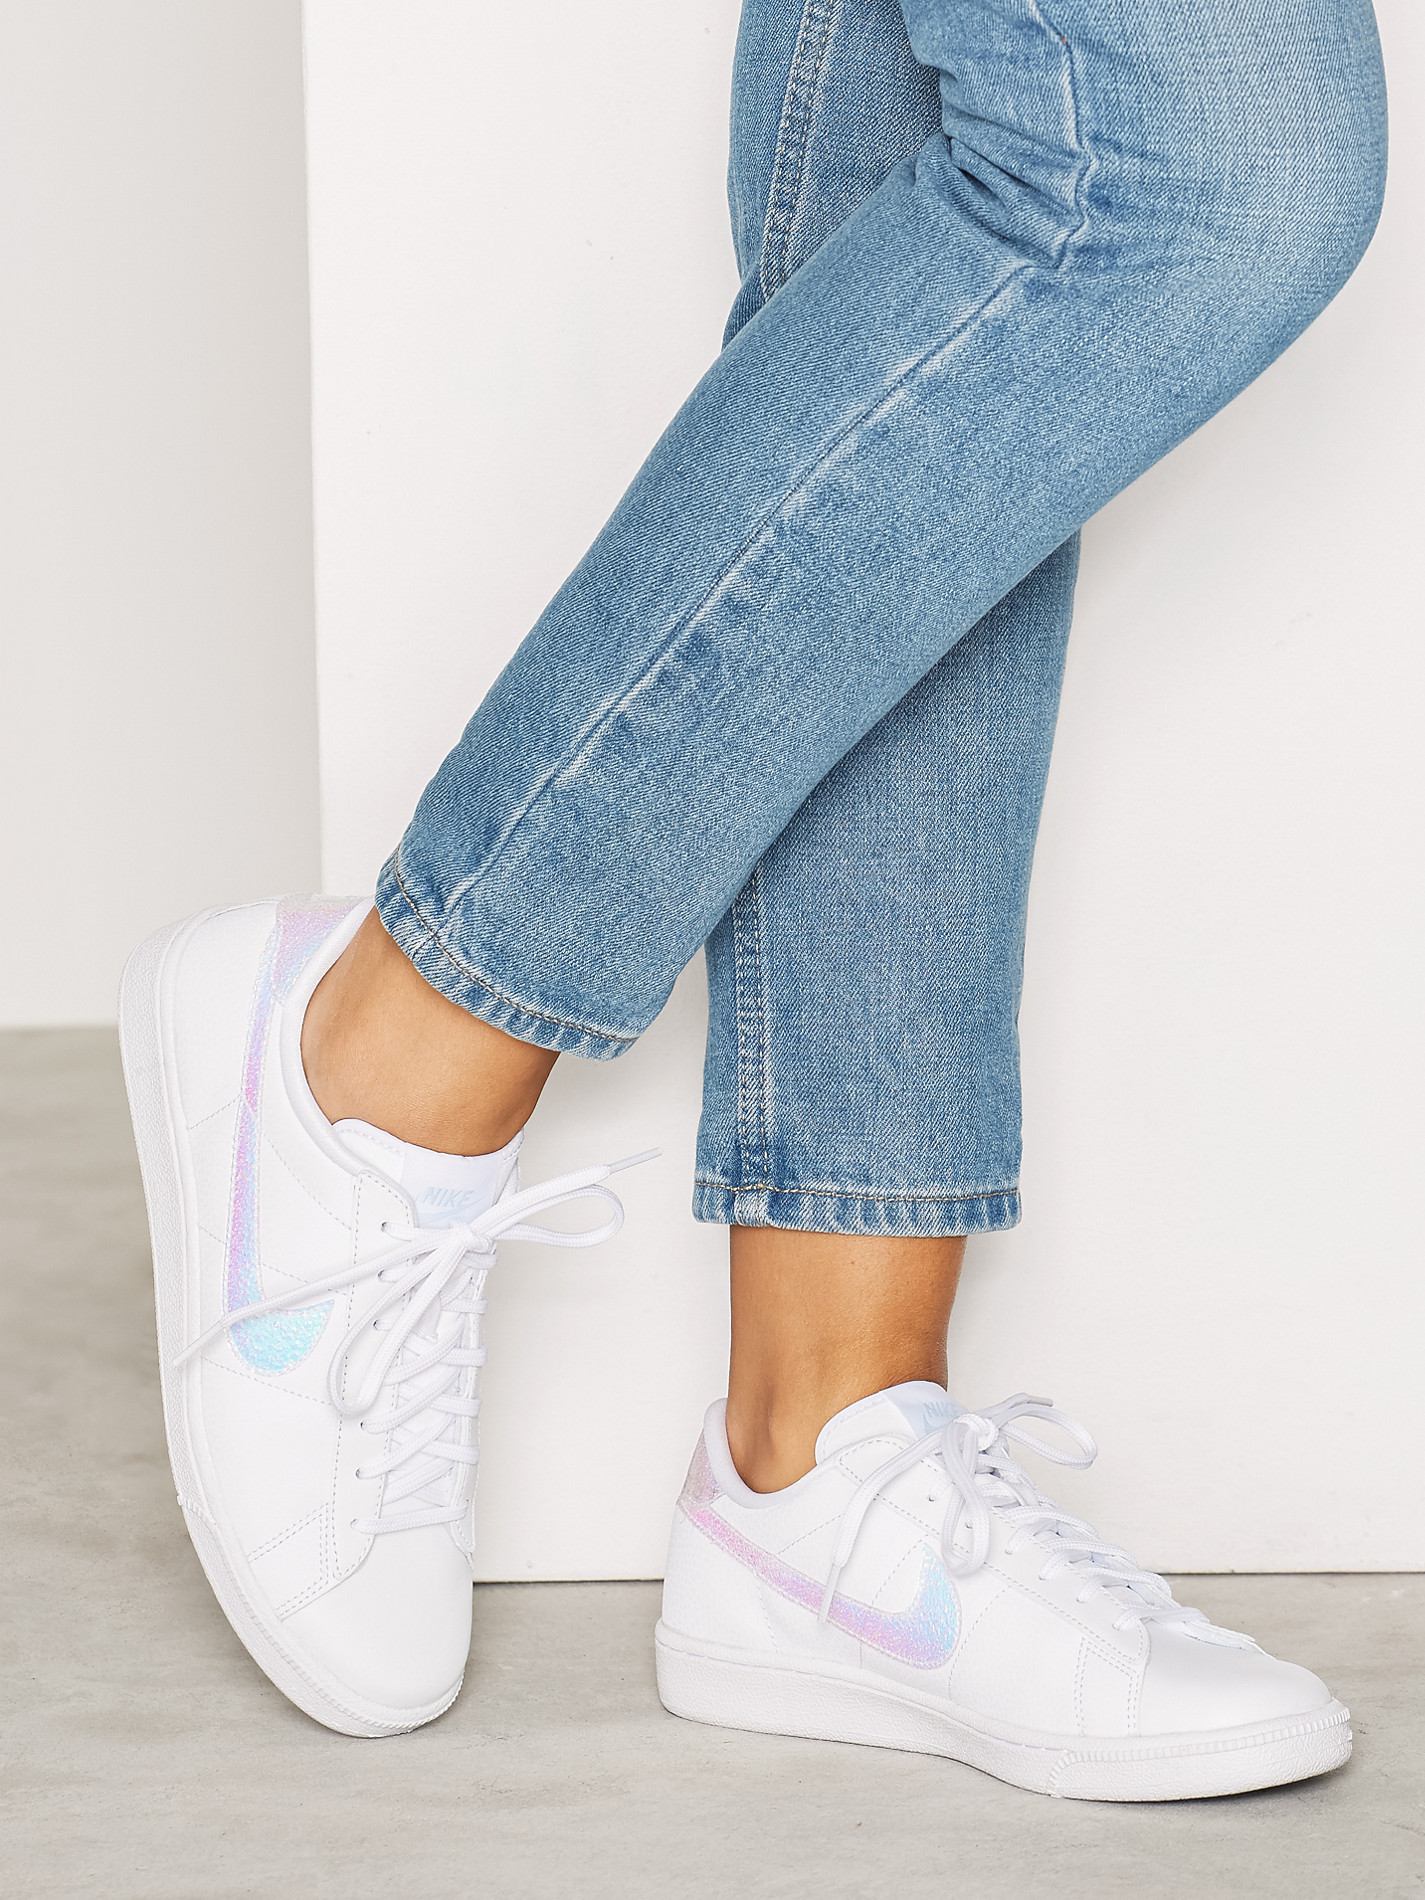 sneakers_nike_shapeup